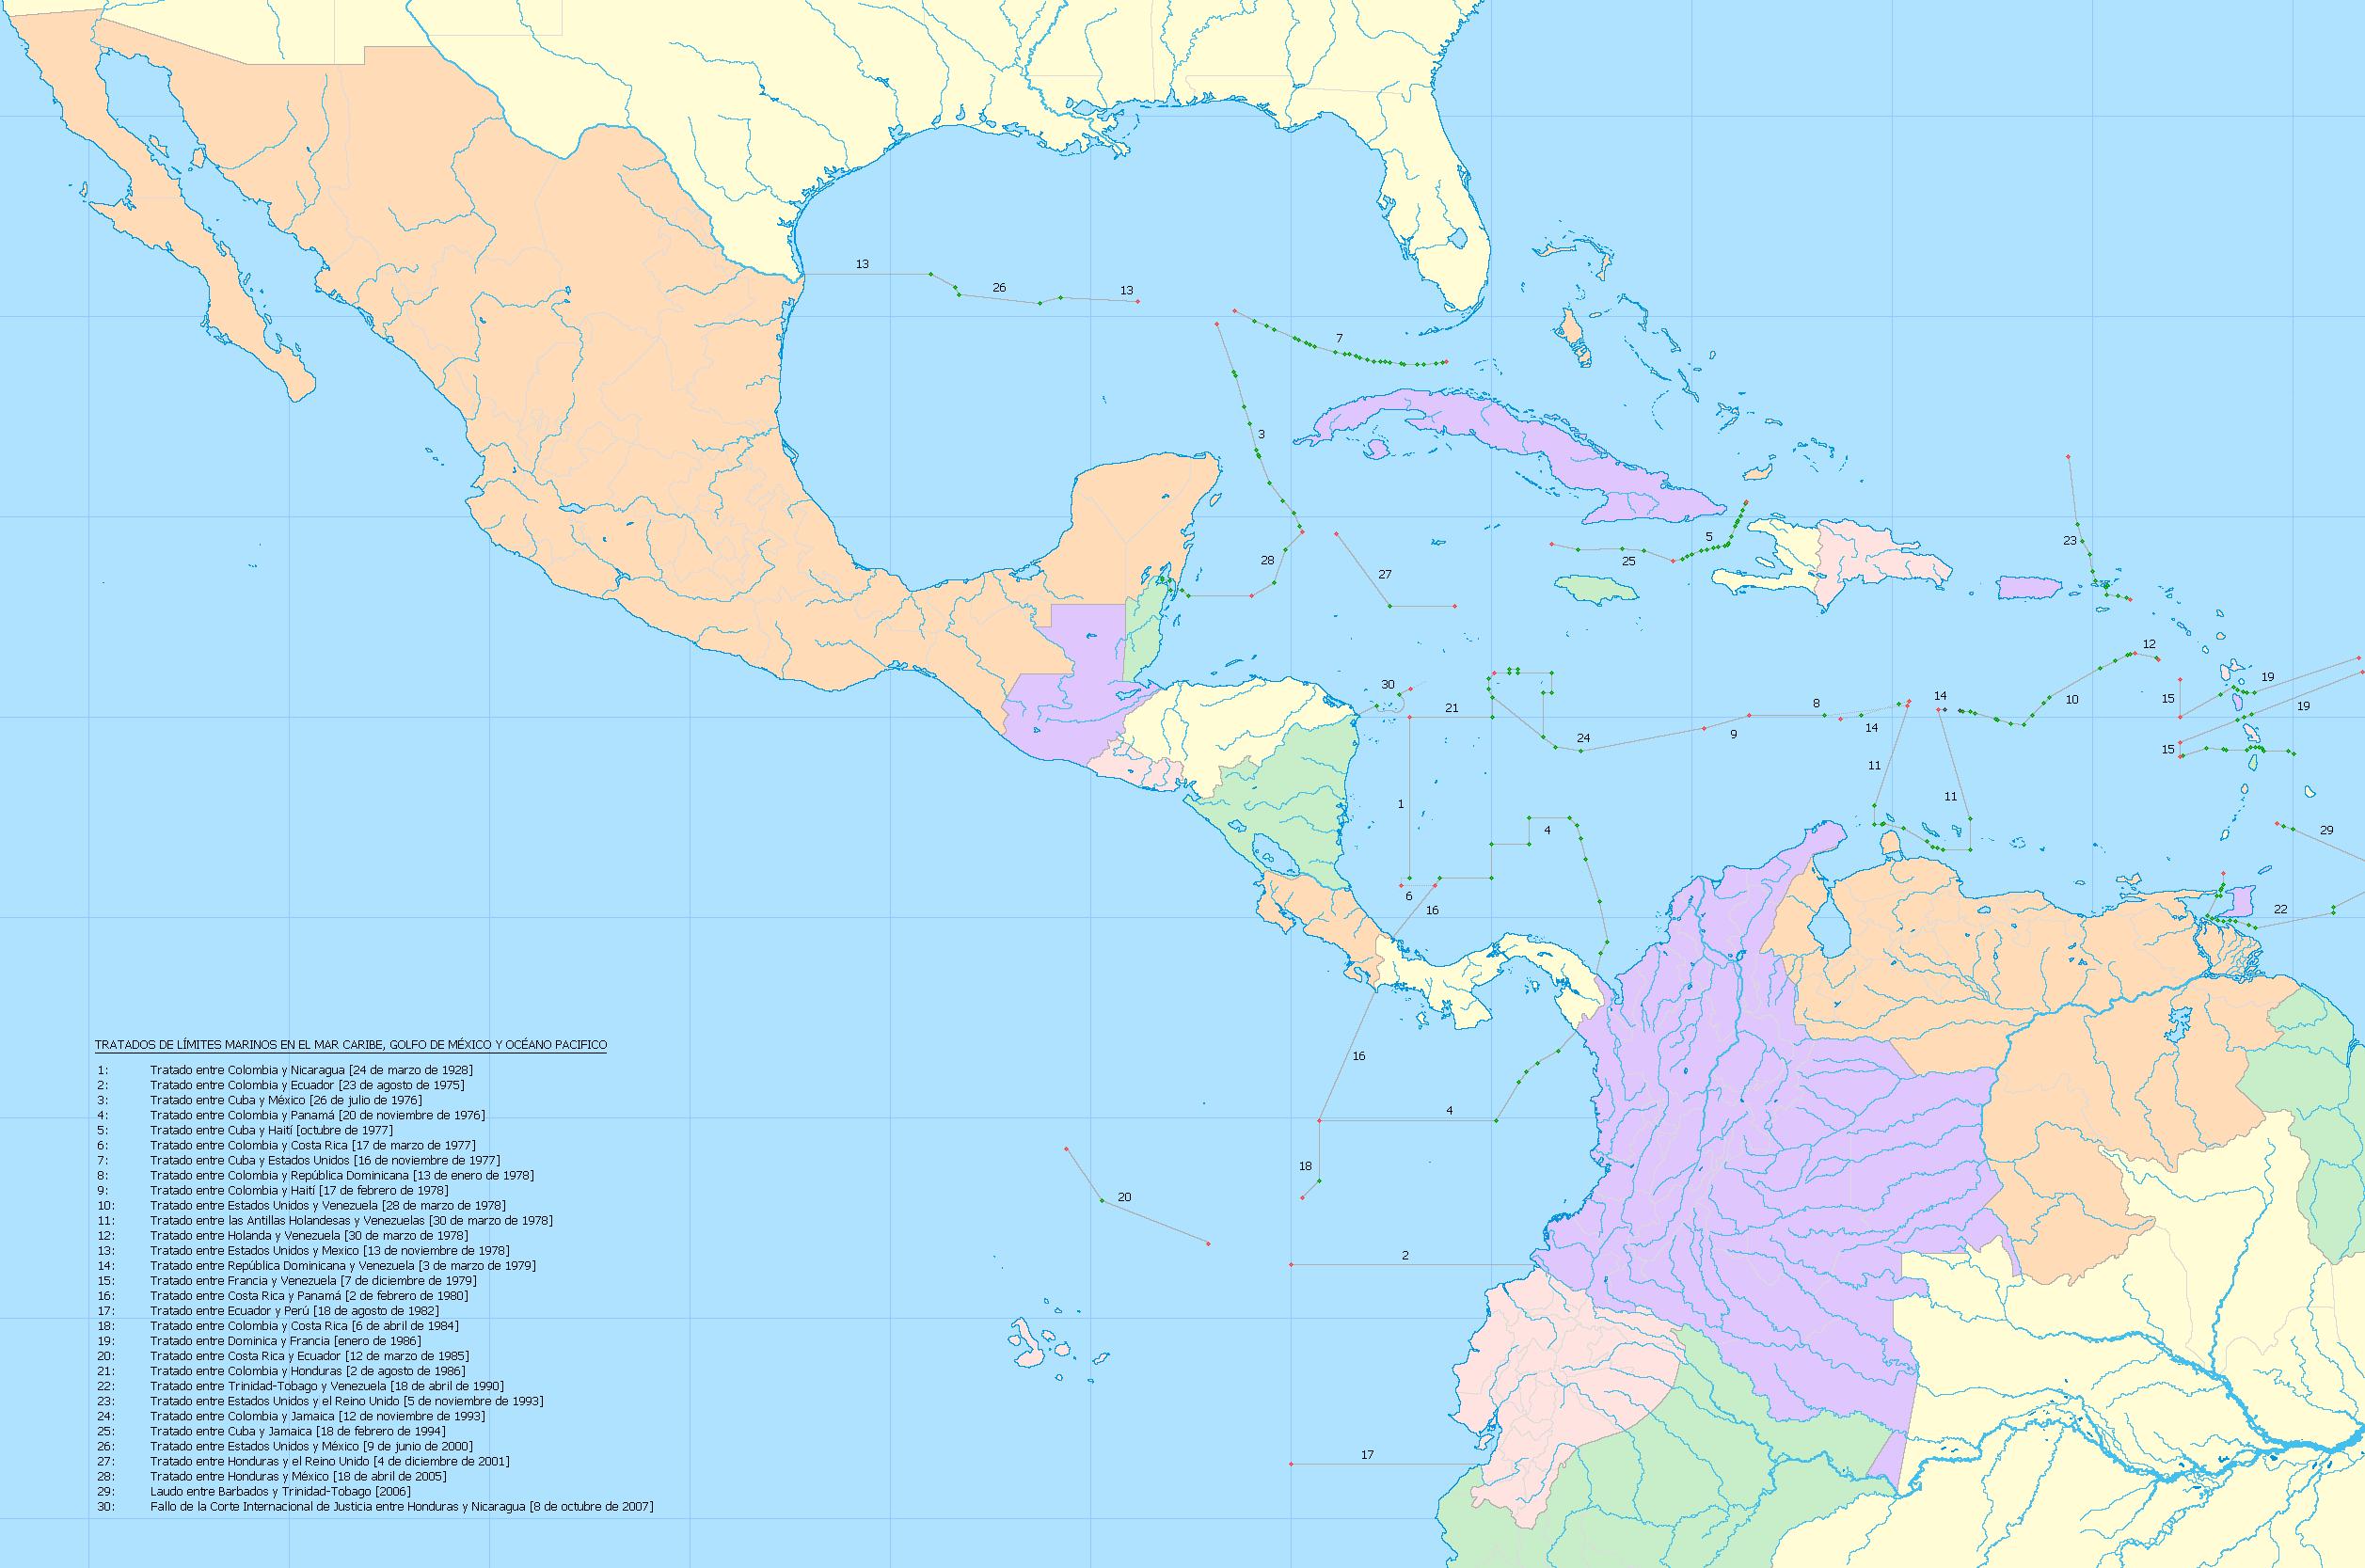 Golfo De Mexico Map.File Mapa Del Caribe Limites Marinos Png Wikimedia Commons